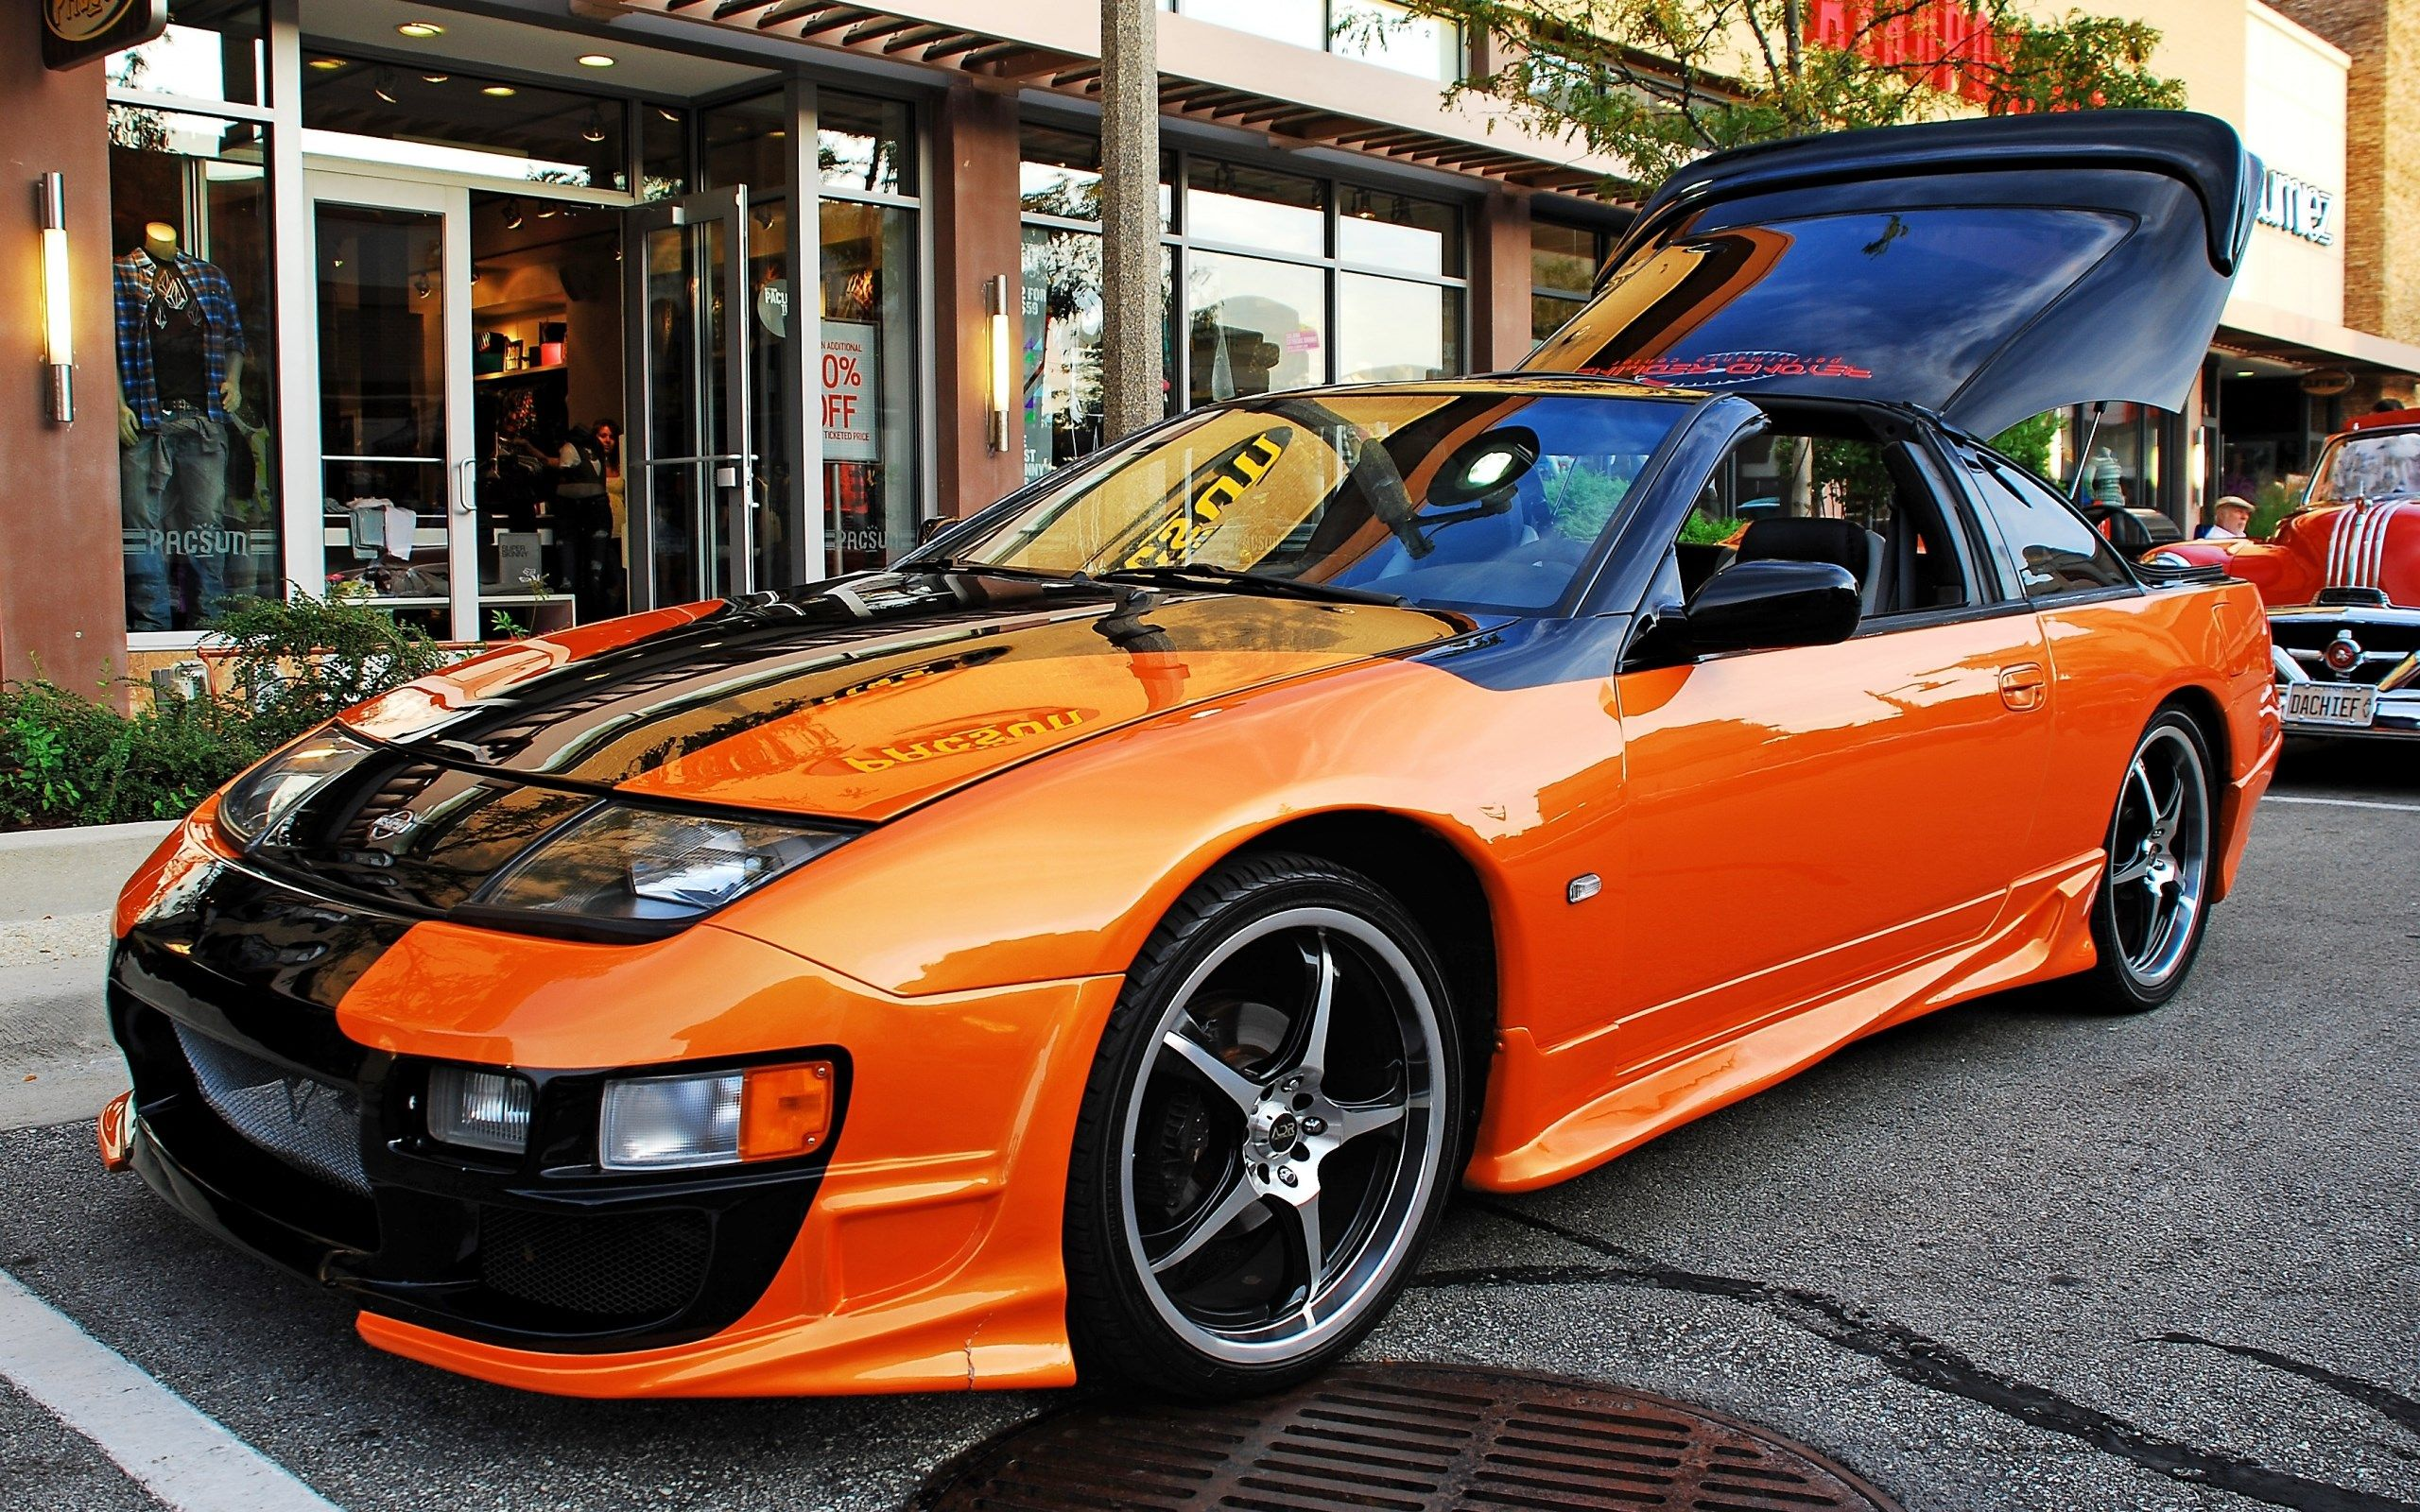 Amazing Orange Nissan 300zx Background